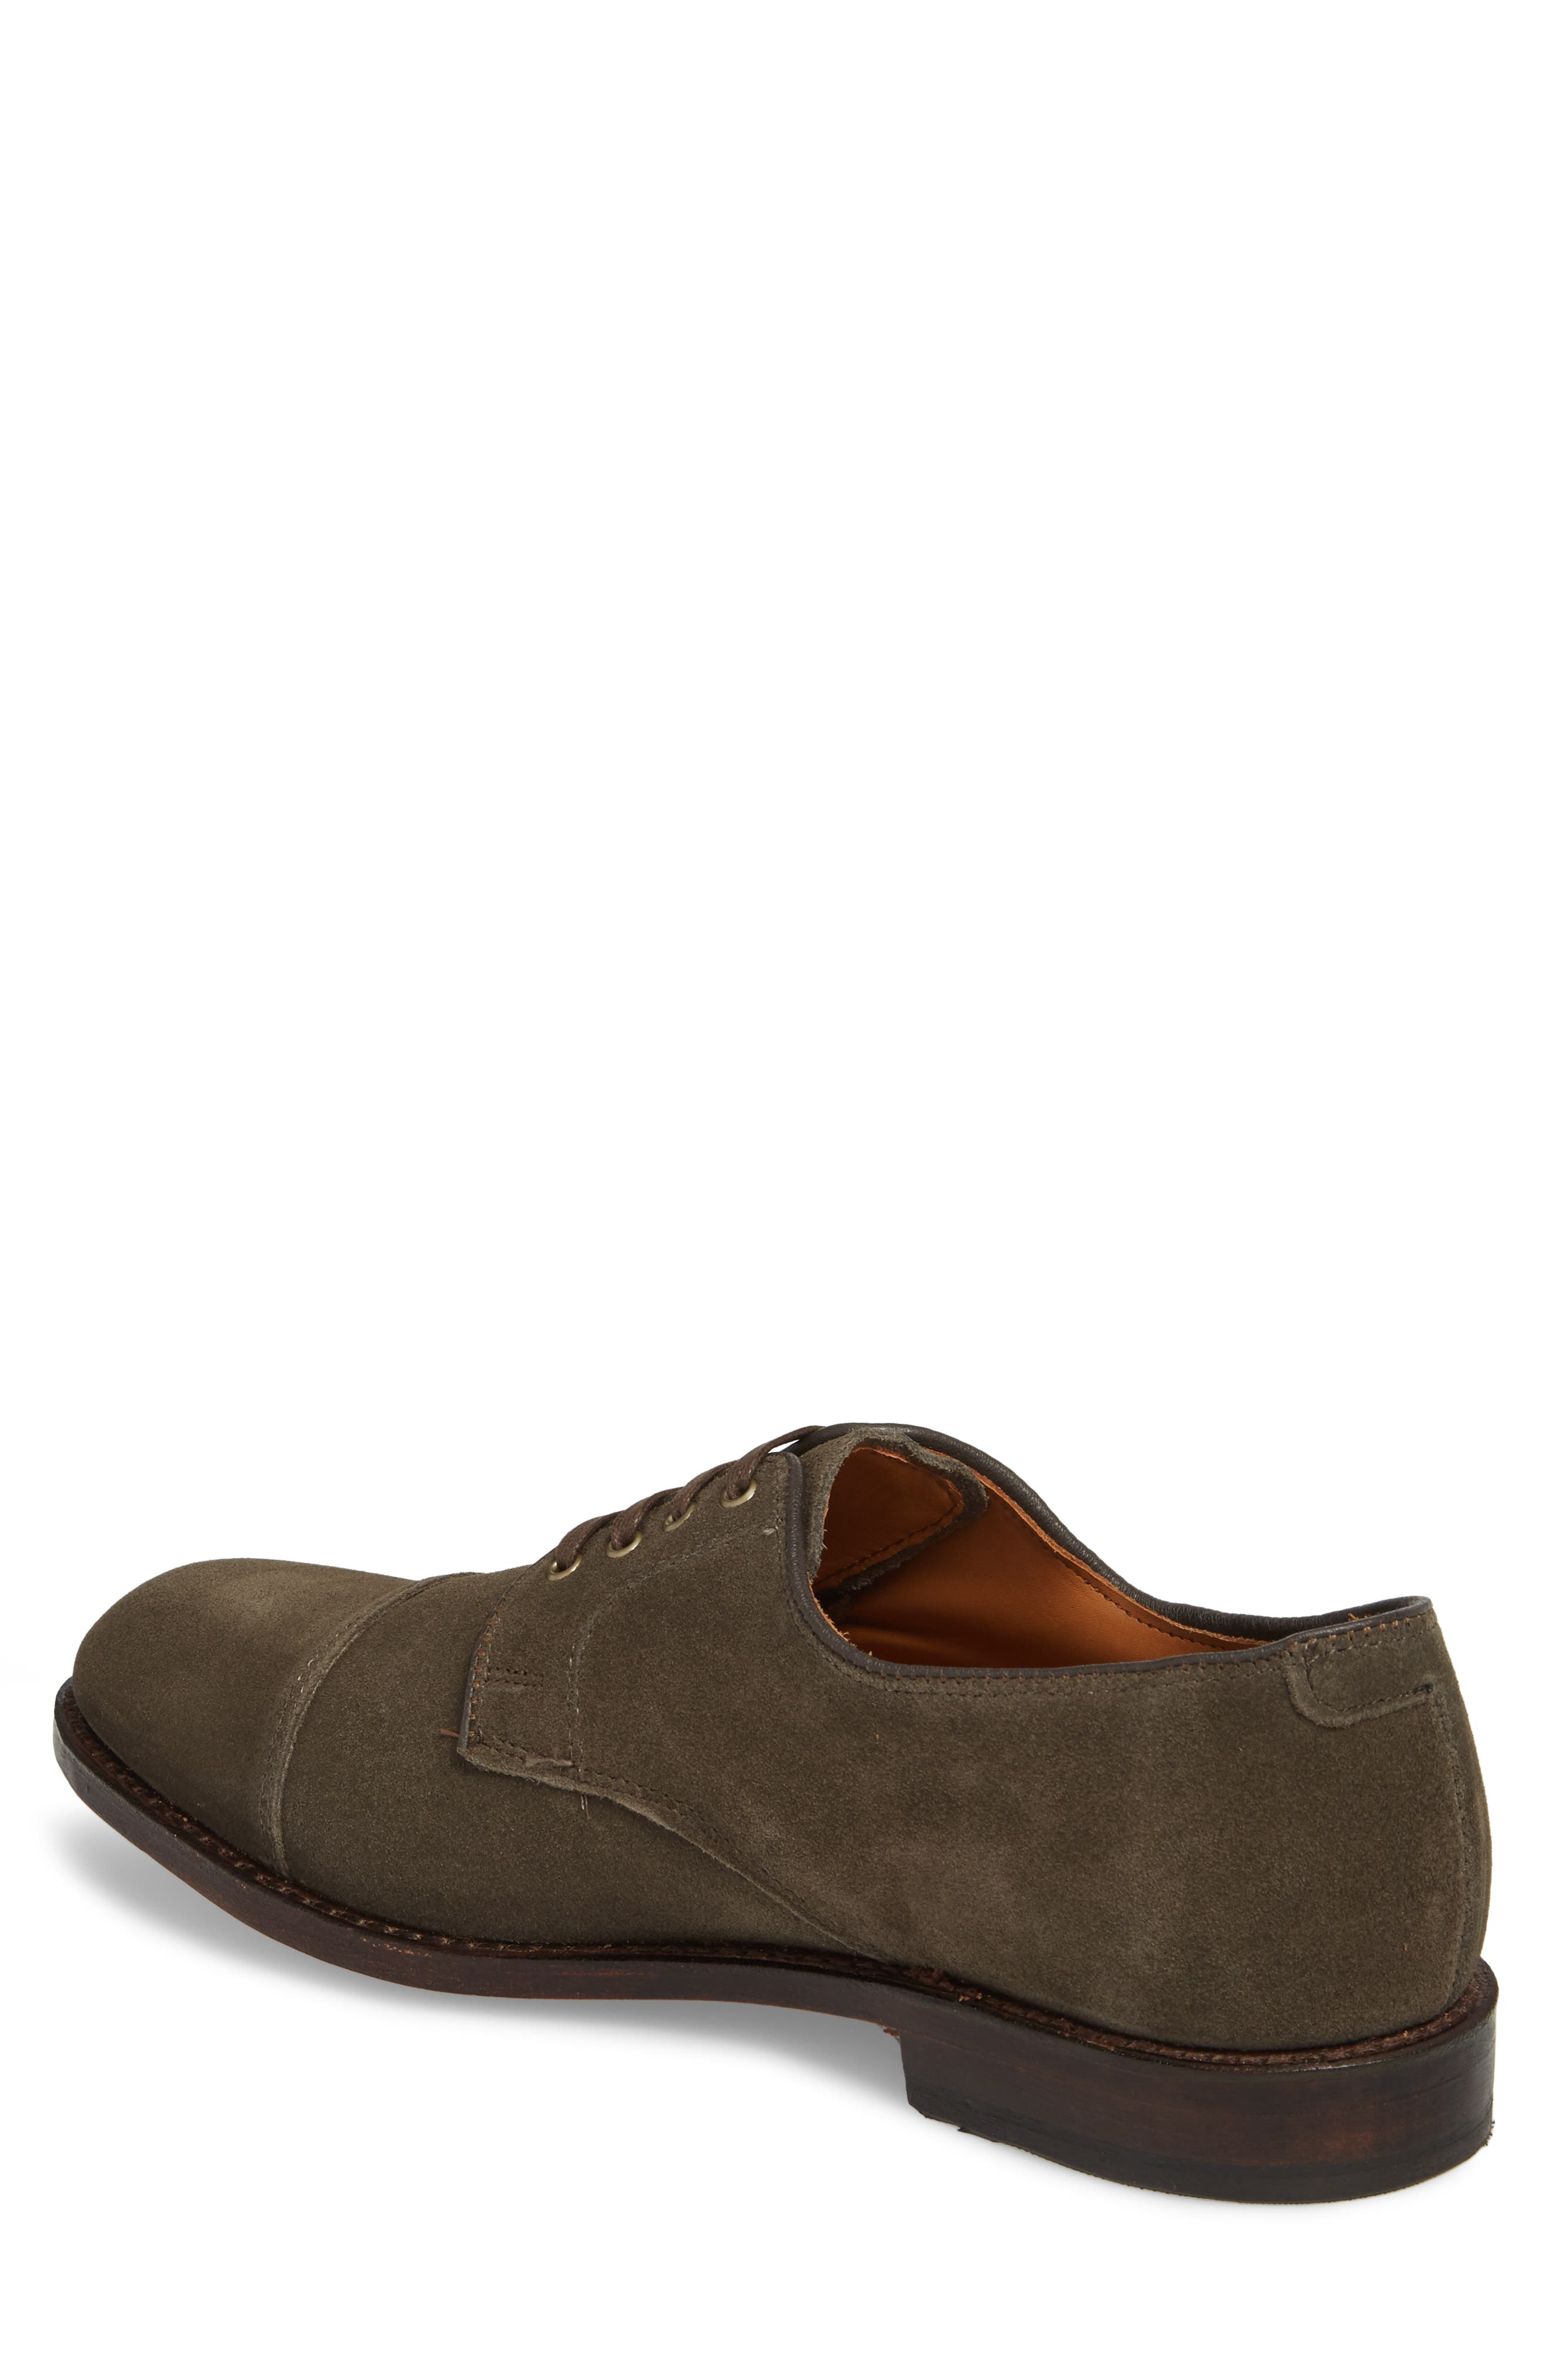 Barrett Cap Toe Derby,                             Alternate thumbnail 2, color,                             Slate Leather